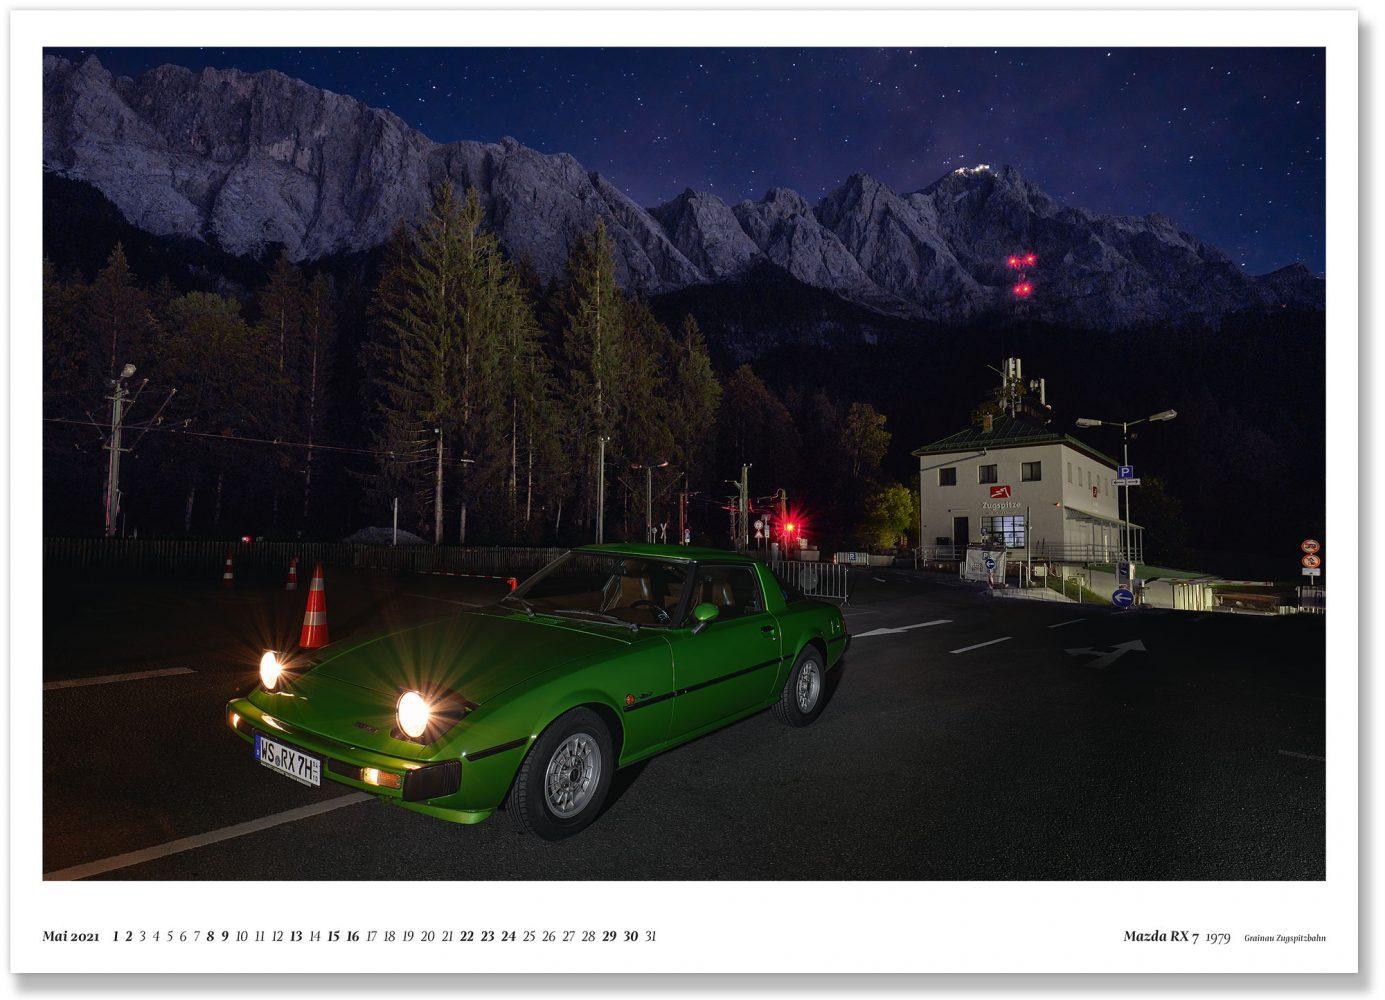 Mazda RX 7 1979 Grainau Zugspitzbahn